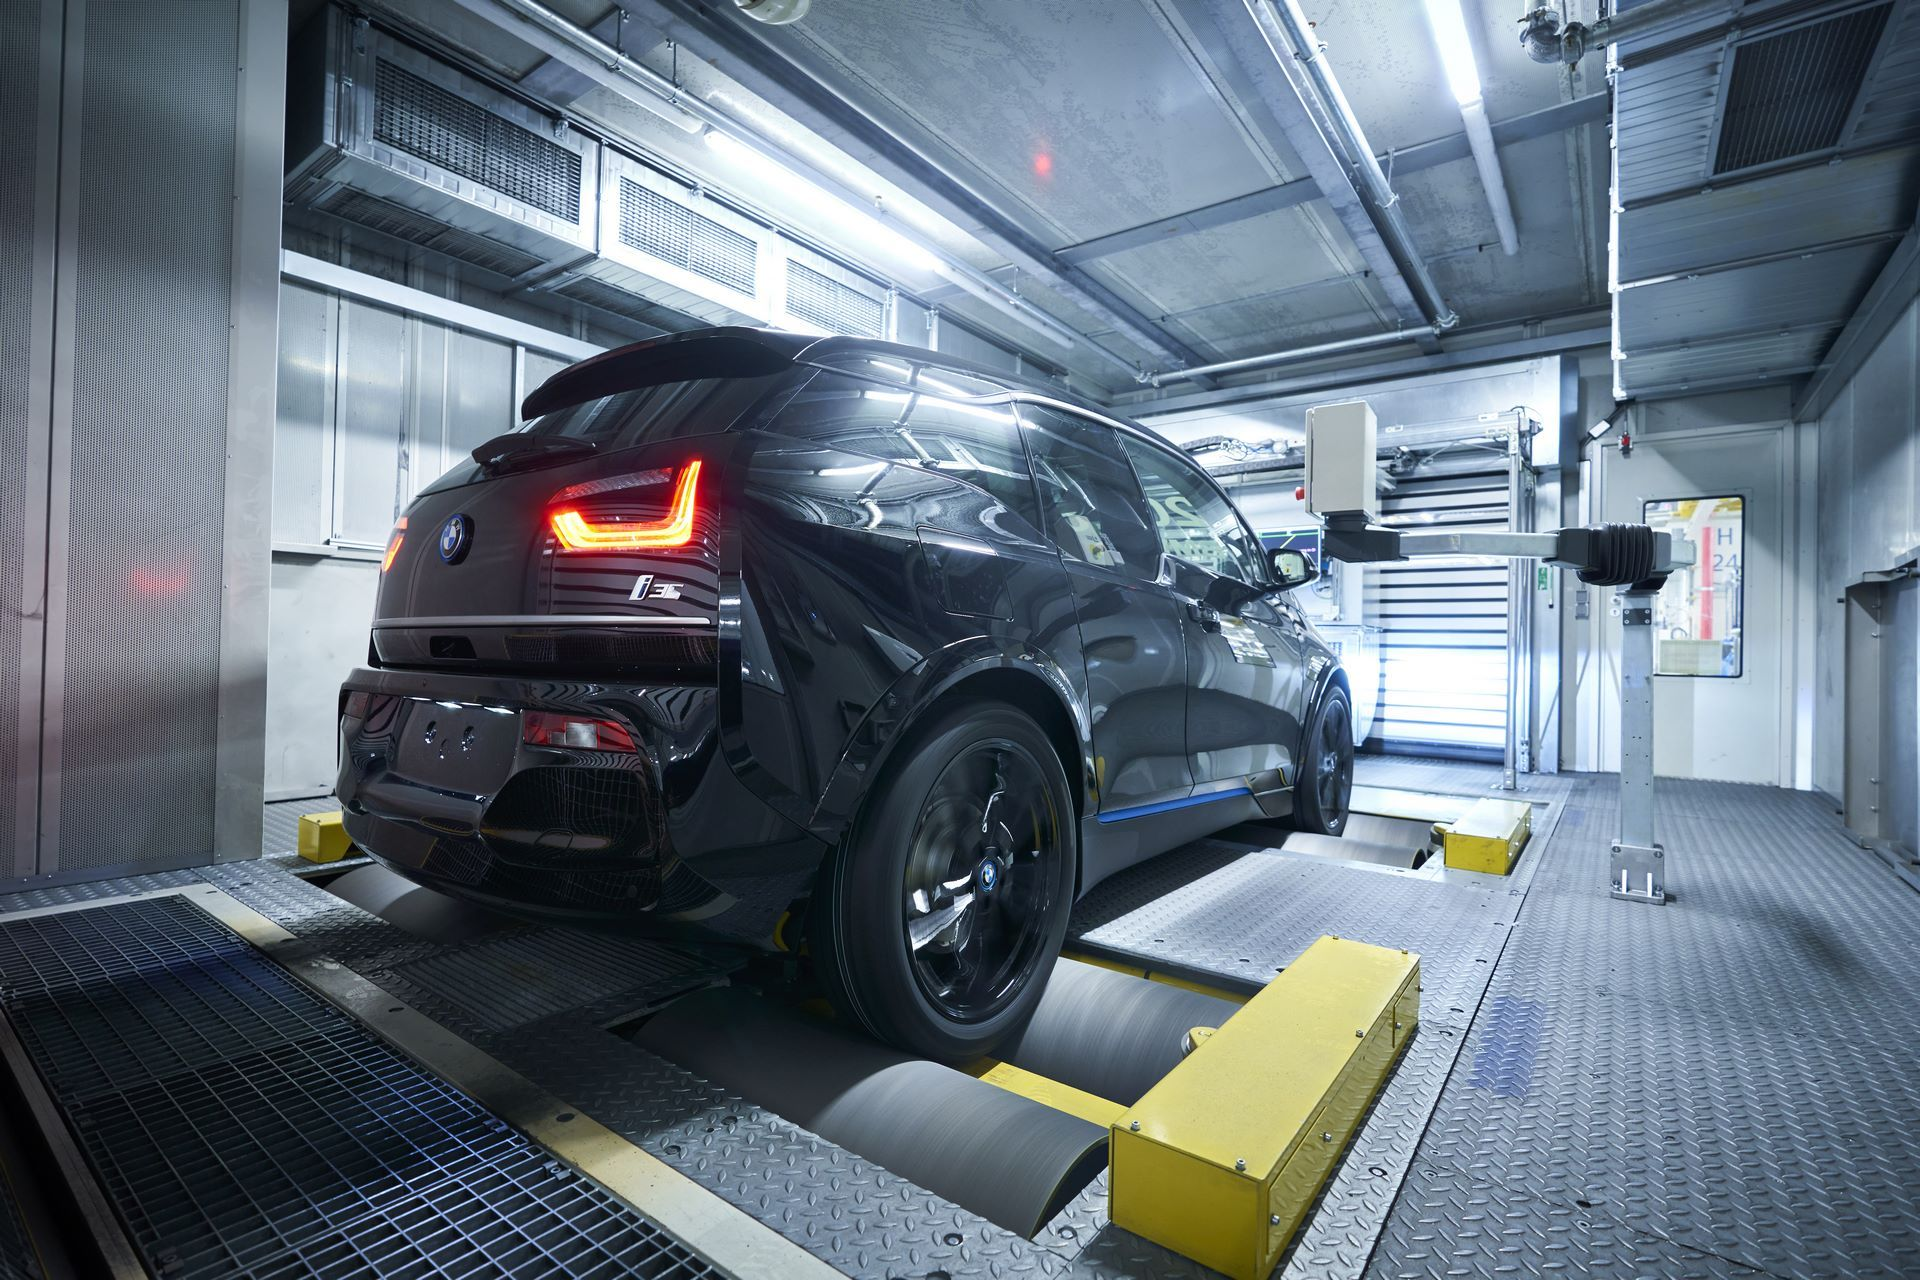 BMW-i8-plant-production-52